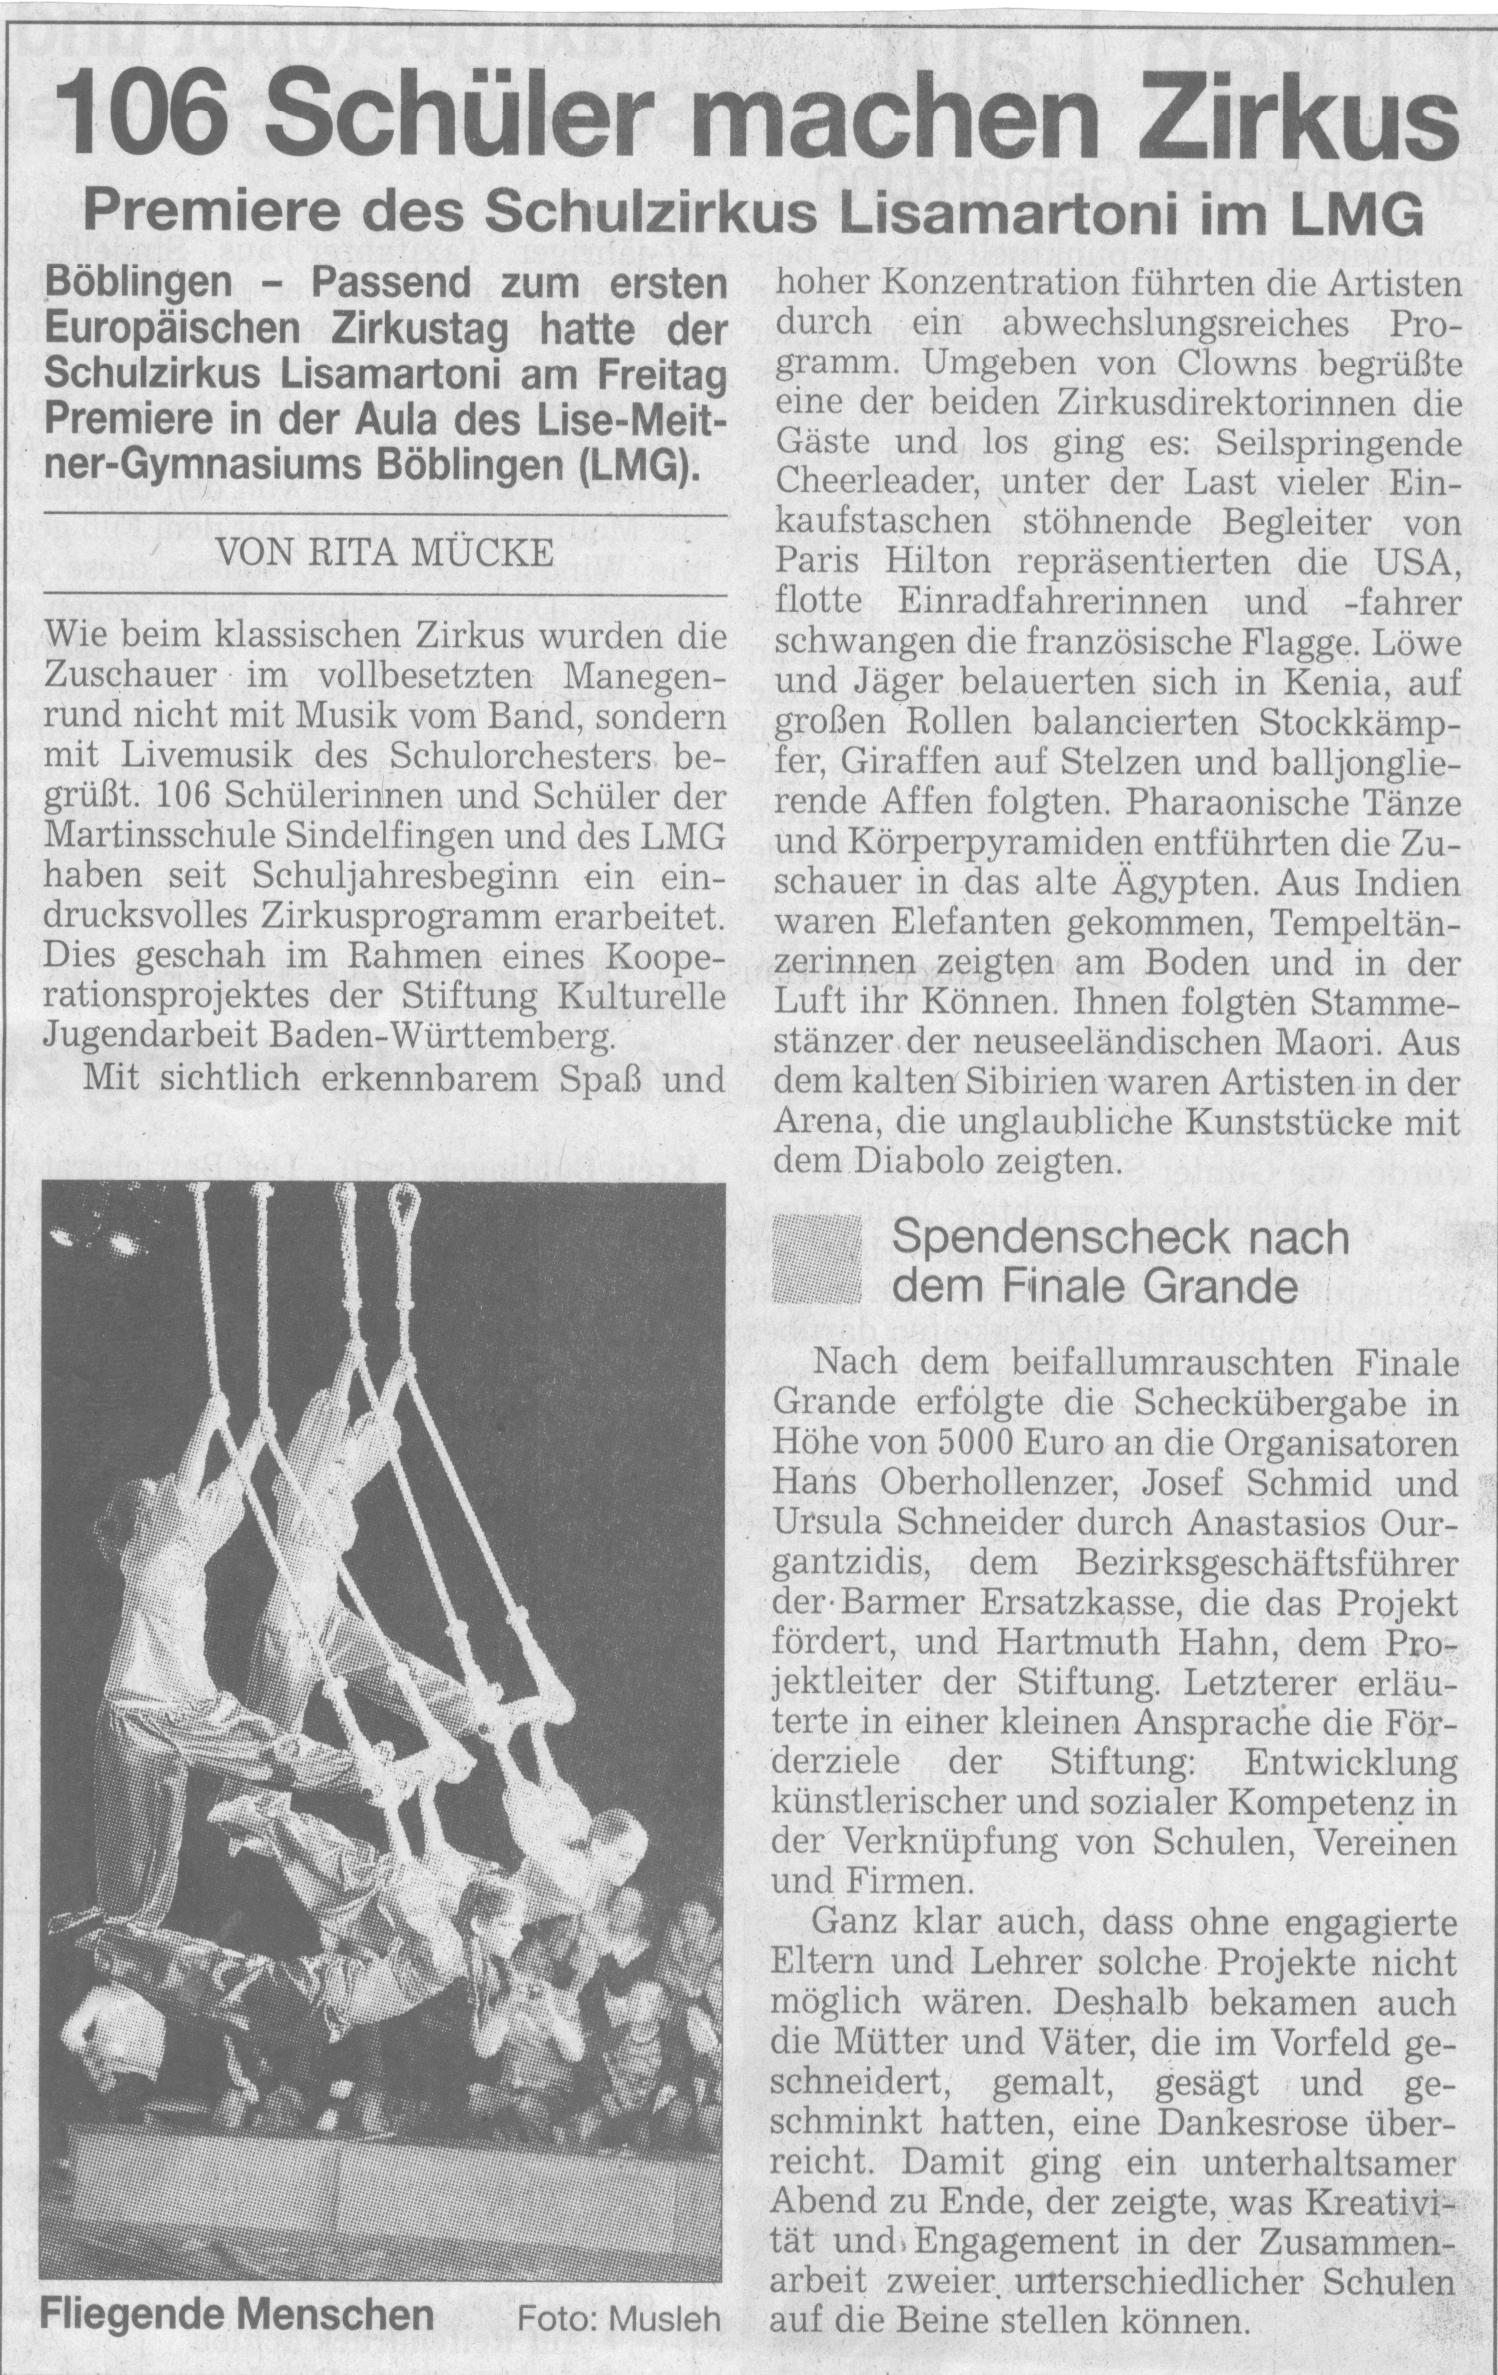 lisamartoni-kreiszeitung-21-04-2008-001.jpg